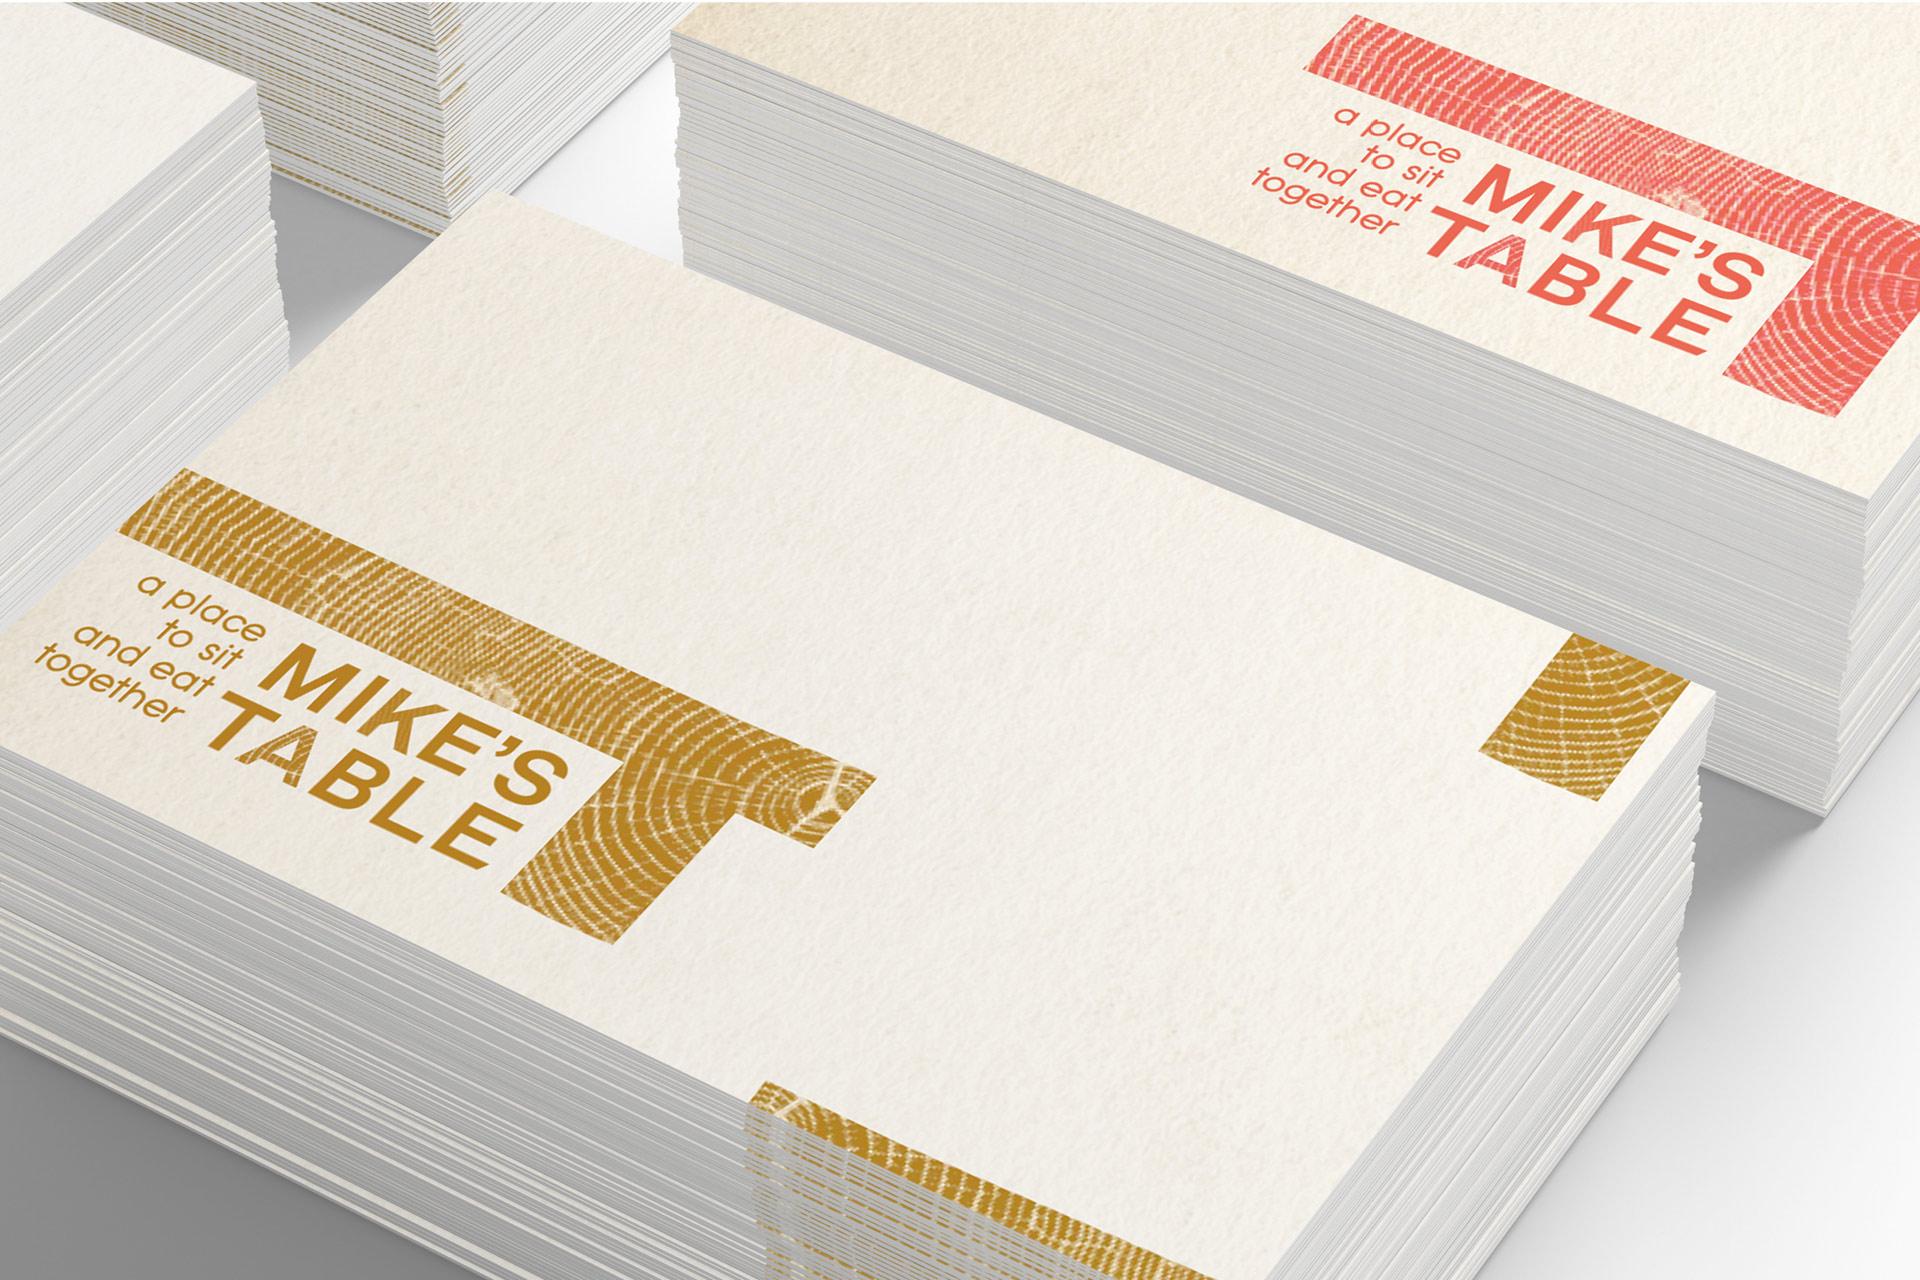 leesimmons-home-mikes-table-branding-visual-identity-design.jpg